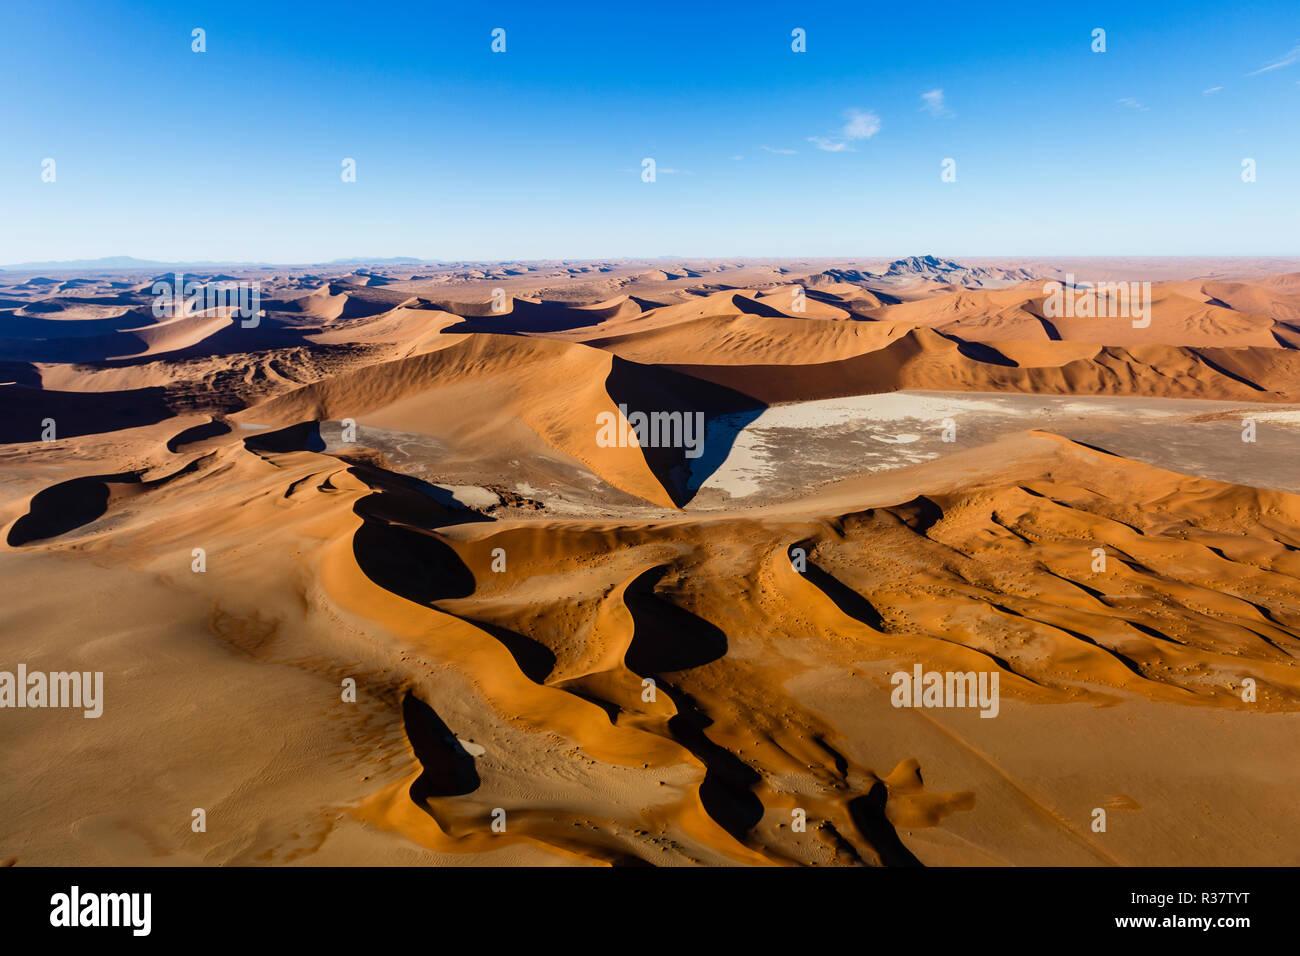 Aerial view, star dune in Sossusvlei National Park, Namib-Naukluft National Park, Namibia Stock Photo